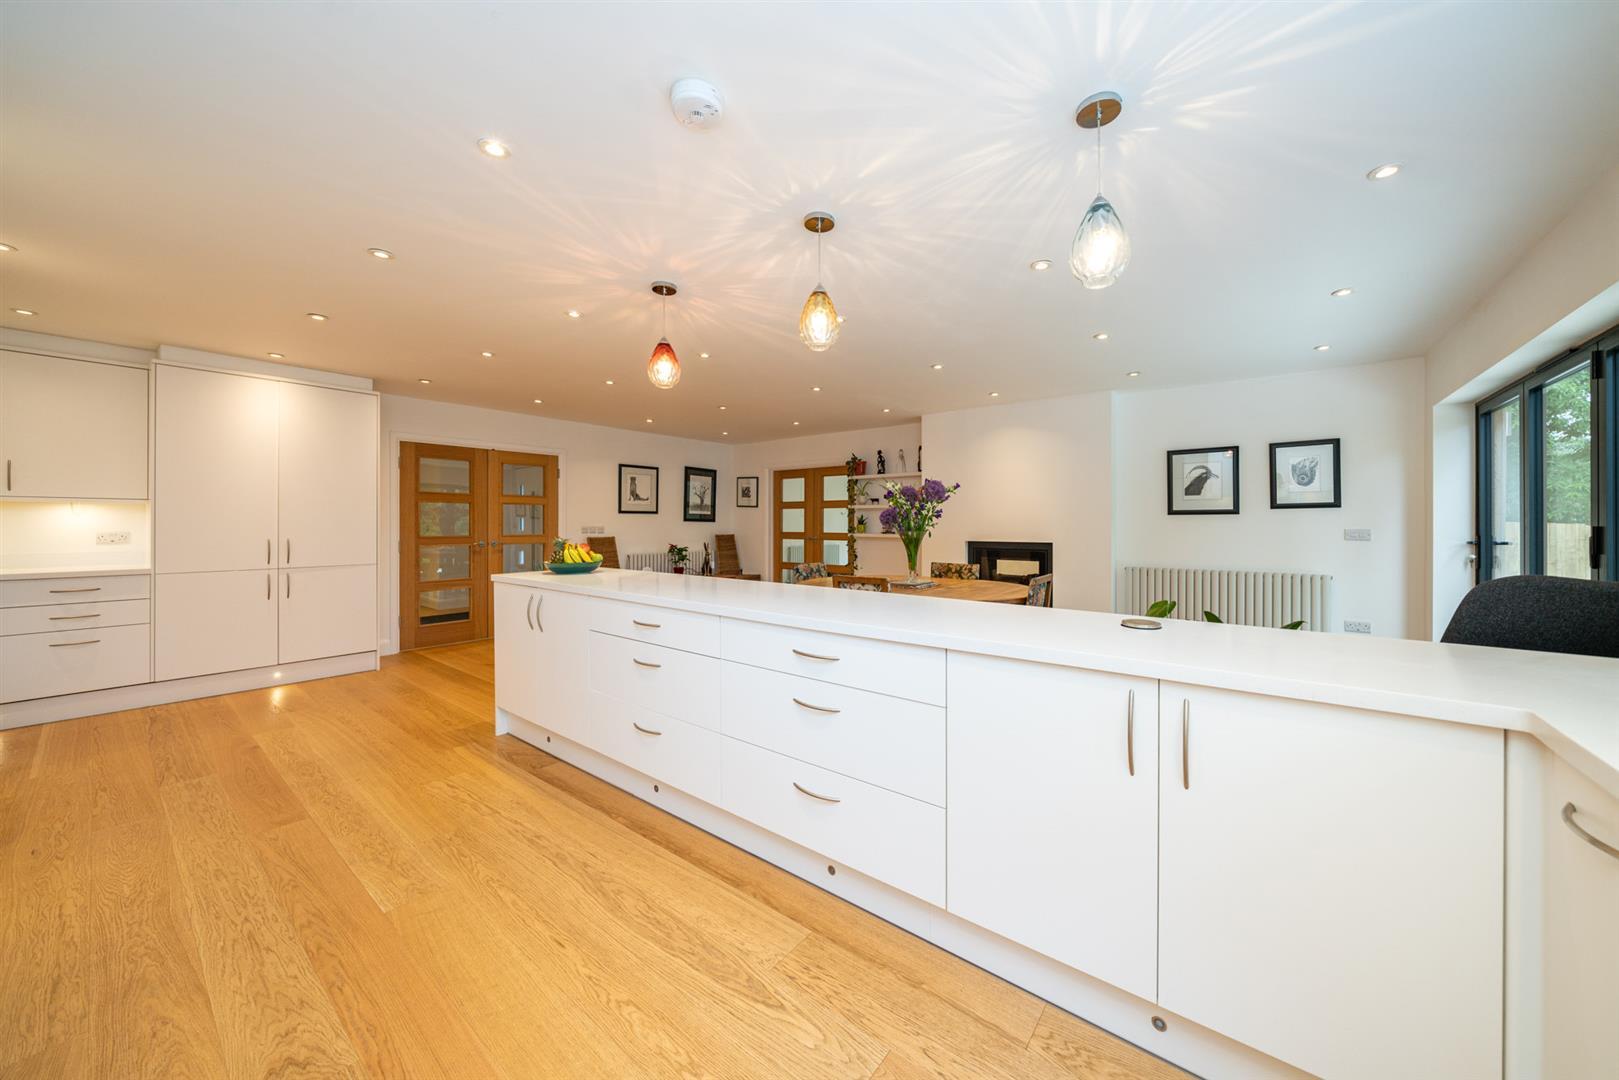 Larchmoor-3013 - kitchen 1.jpg